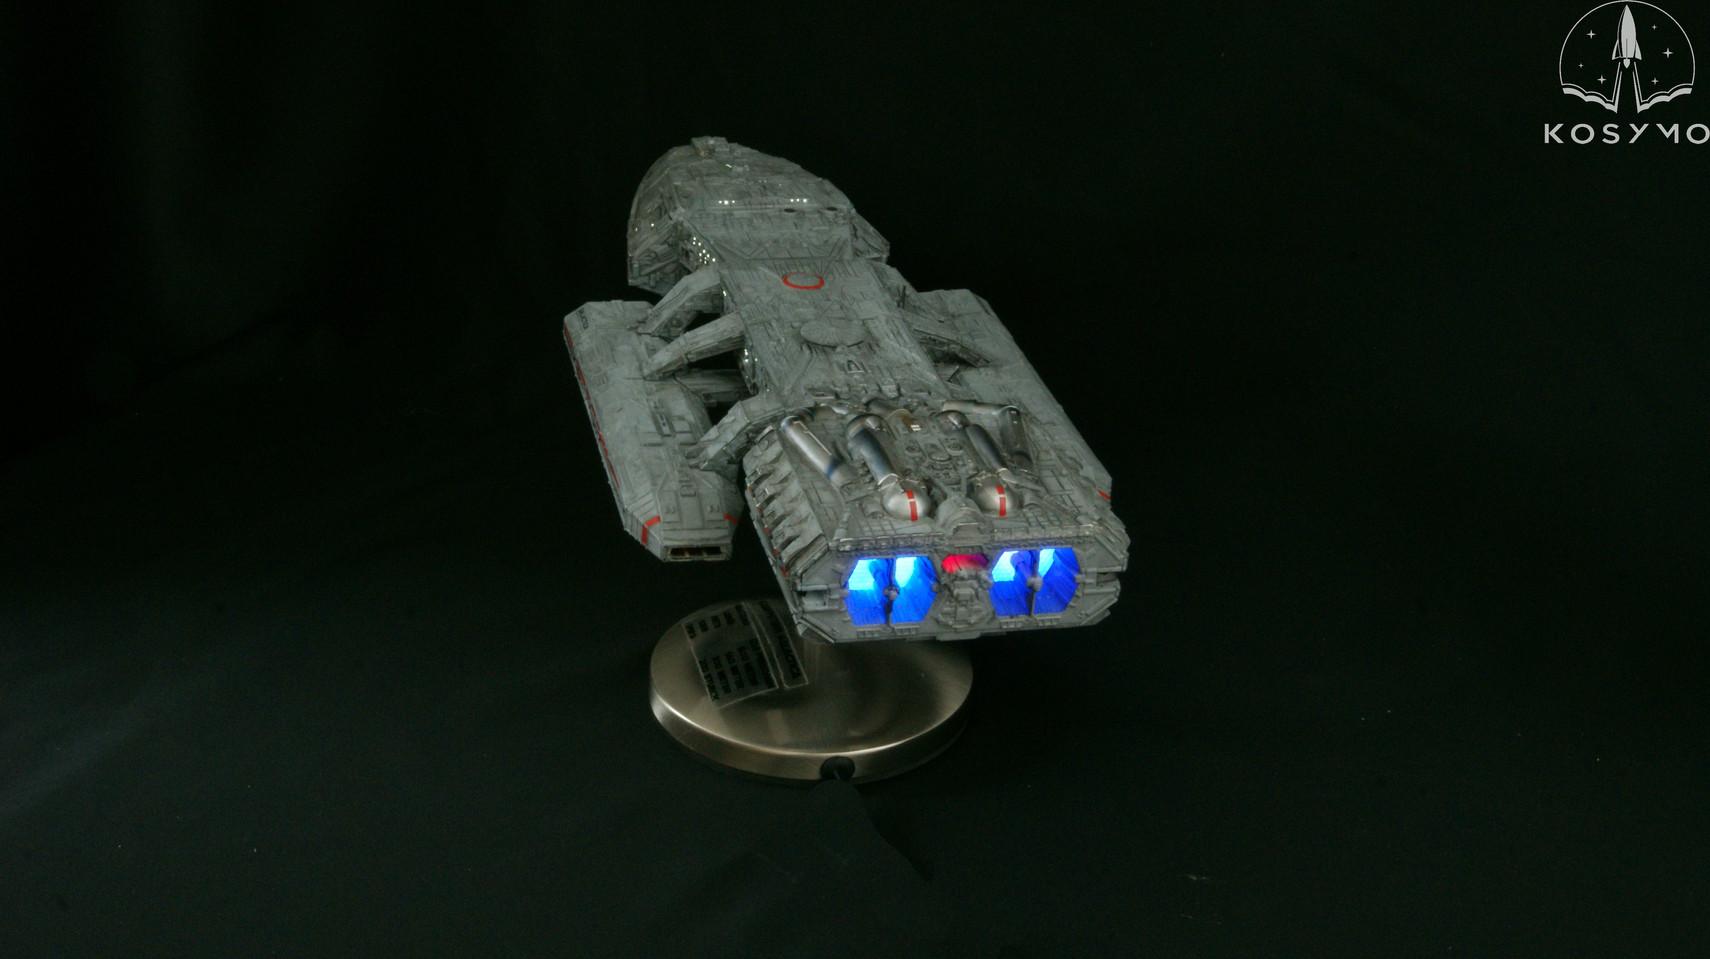 Galactica_034.JPG